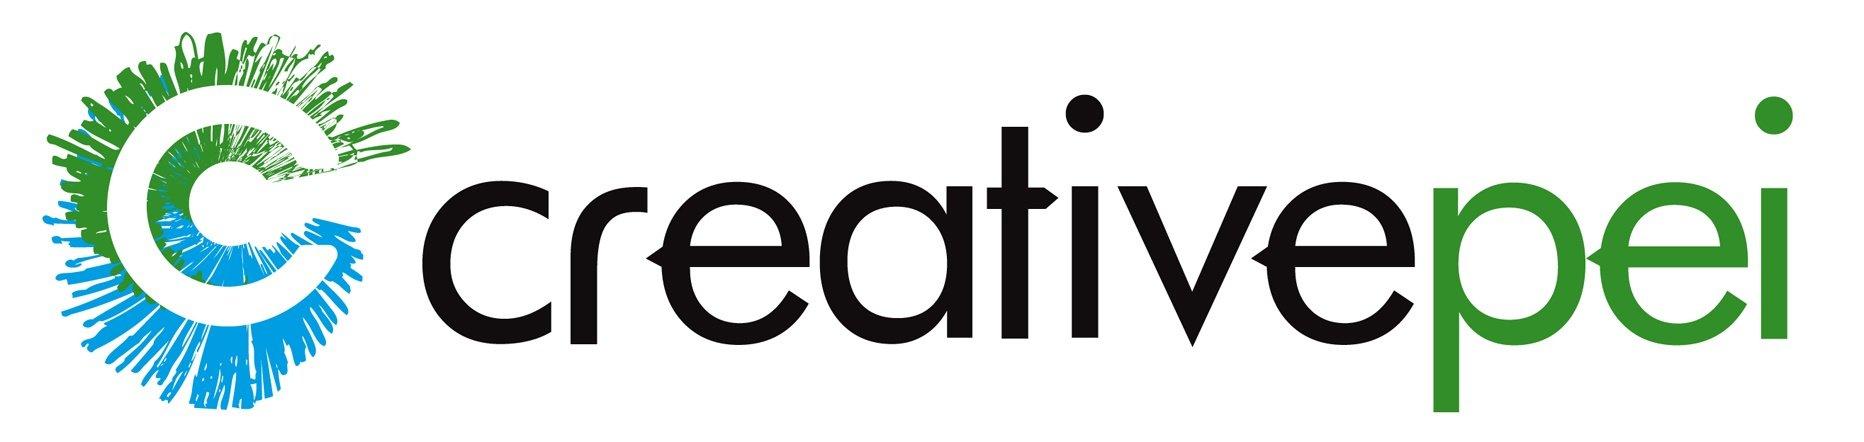 Creative PEI logo